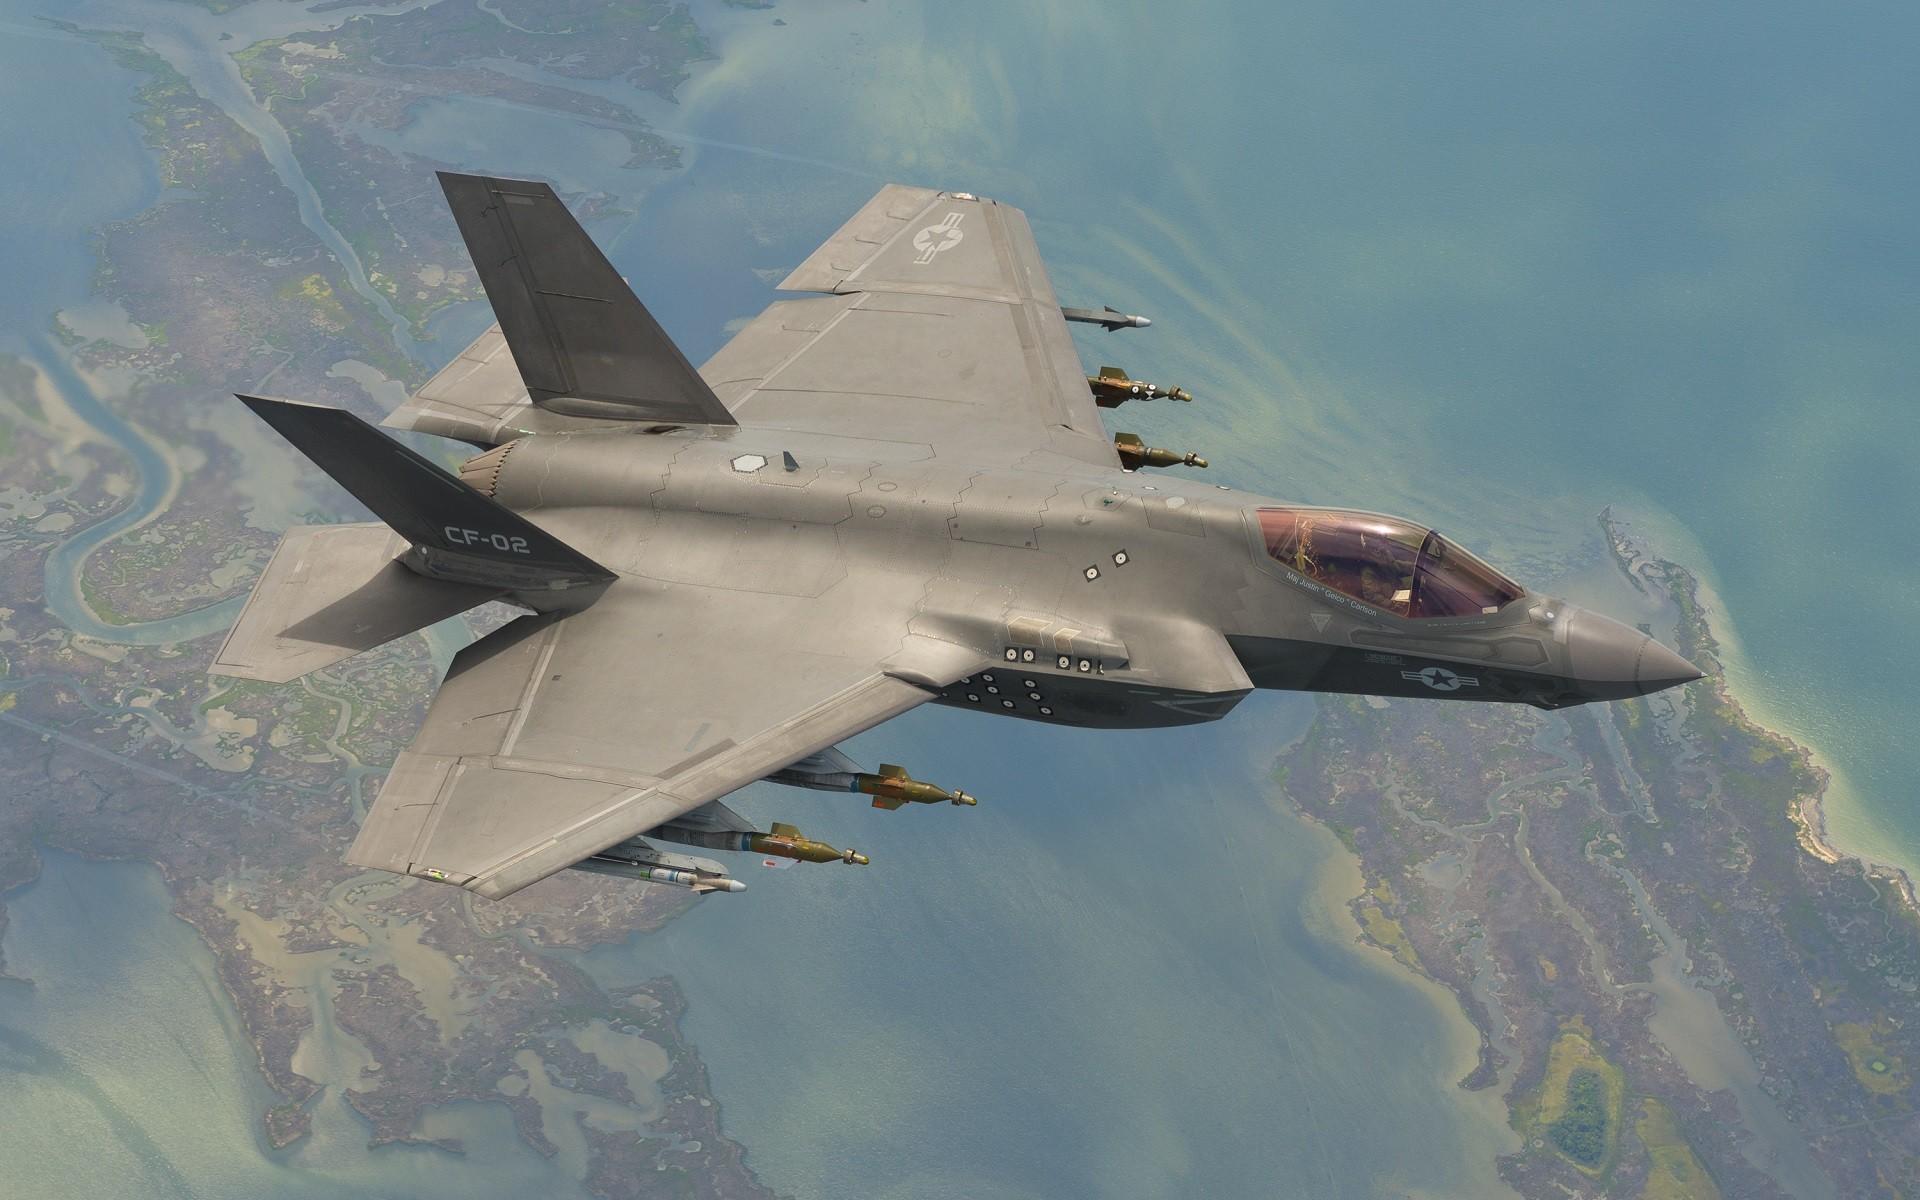 General 1920x1200 aircraft military aircraft landscape Lockheed Martin F-35 Lightning II